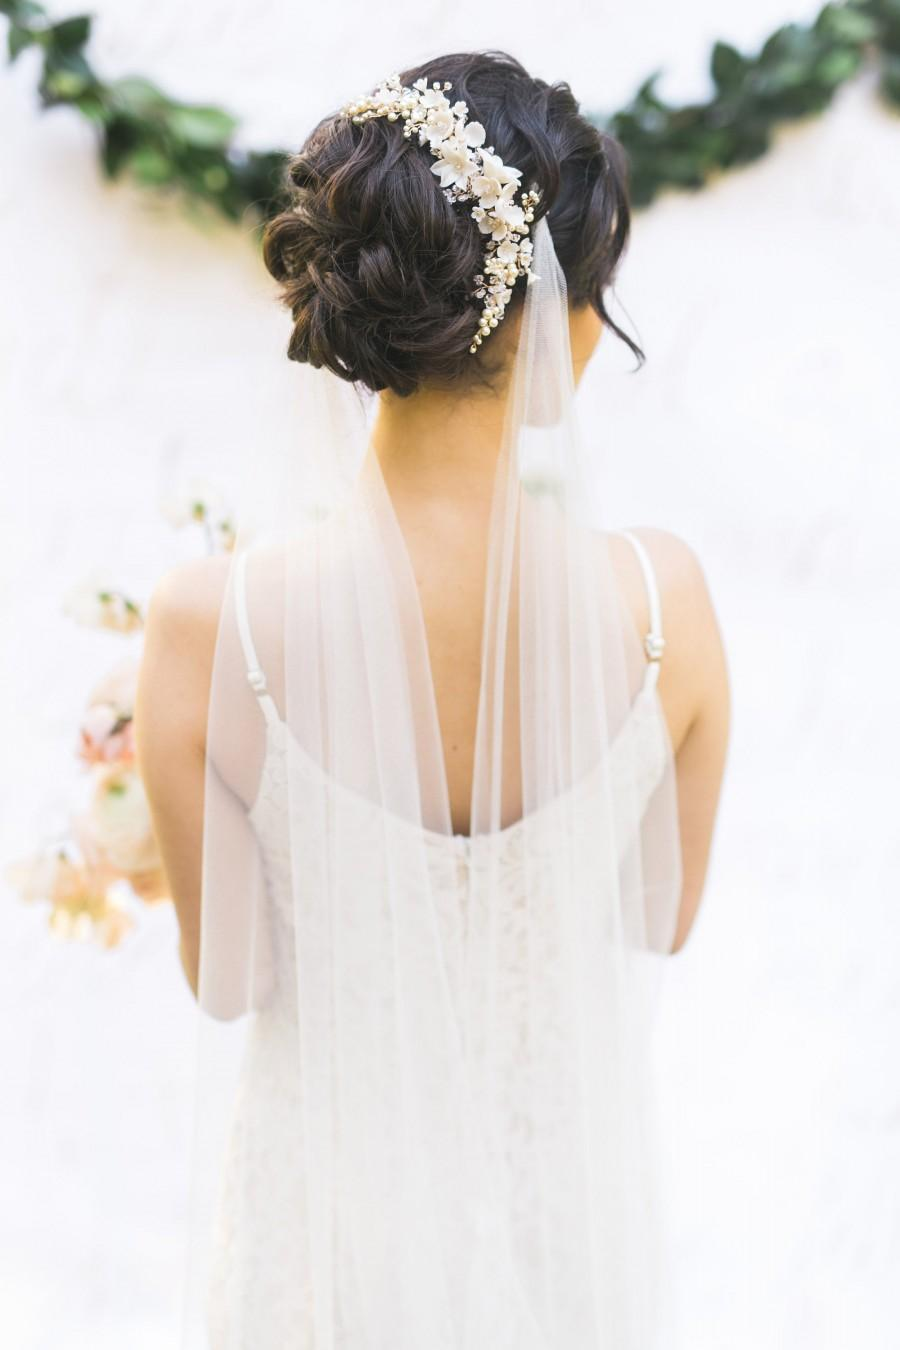 Wedding - Wedding Veil, Bridal Veil, Draped Veil, Draped Wedding Veil, Draped Bridal Veil, Long Veil, Ivory Veil, Ivory Draped Veil, White Draped Veil